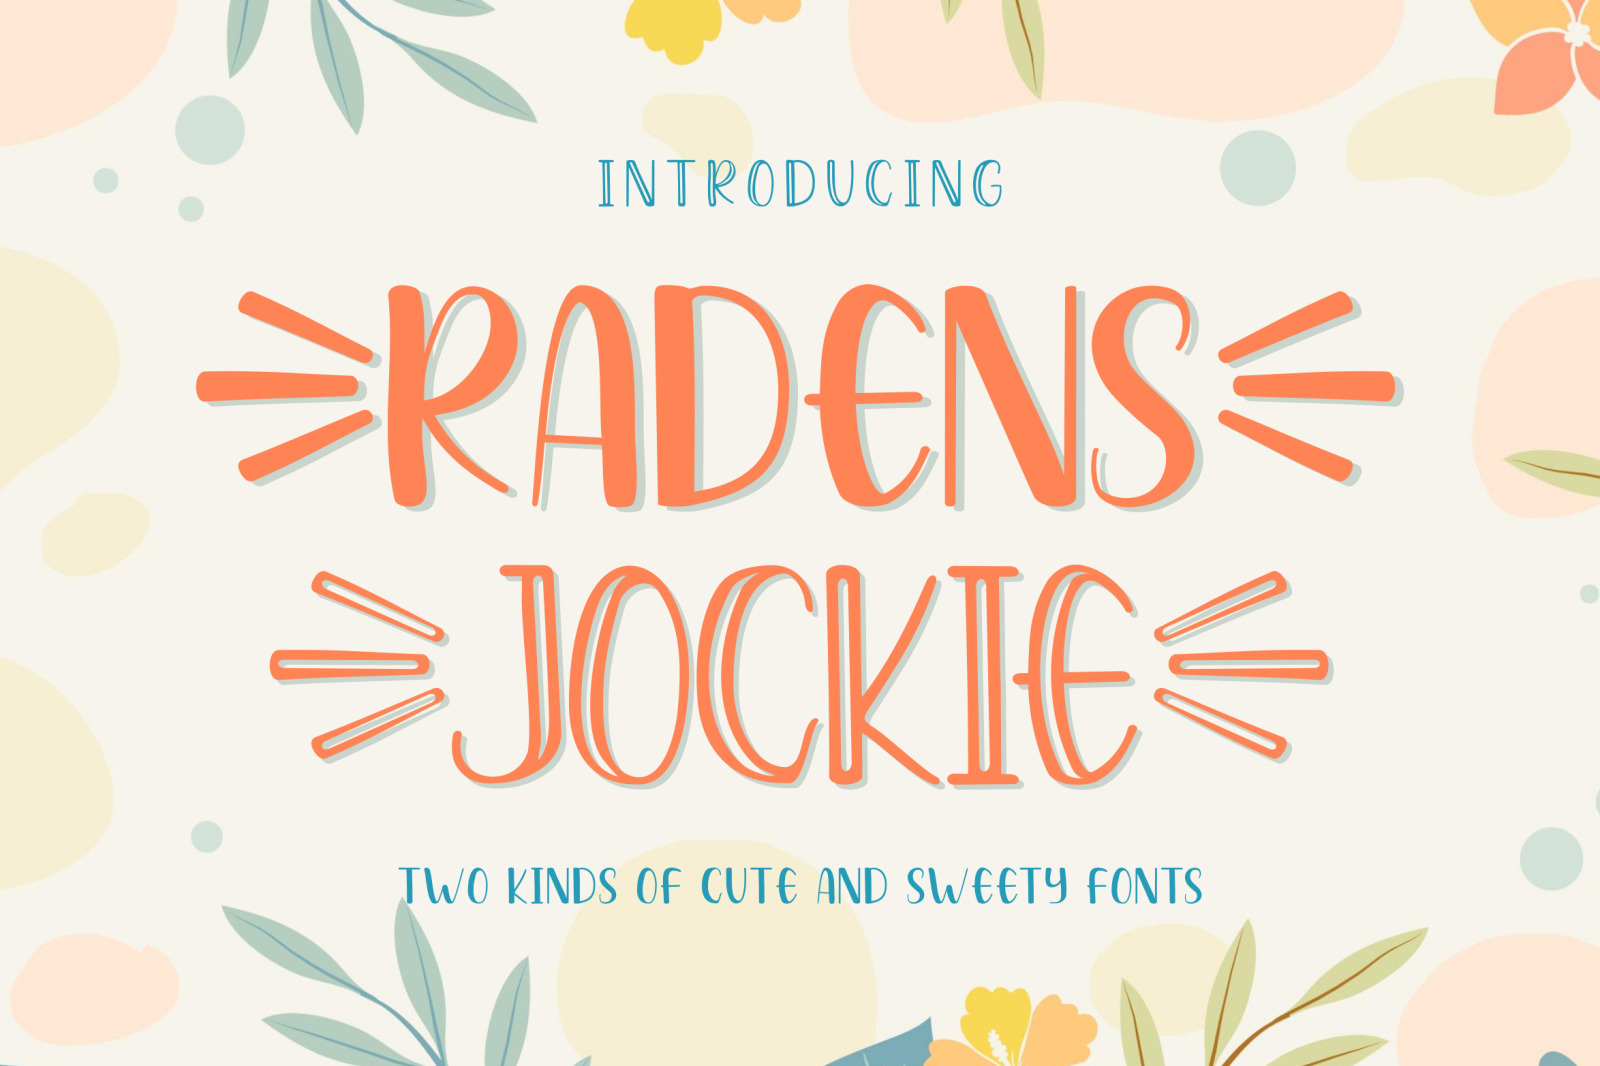 Radens Jockie